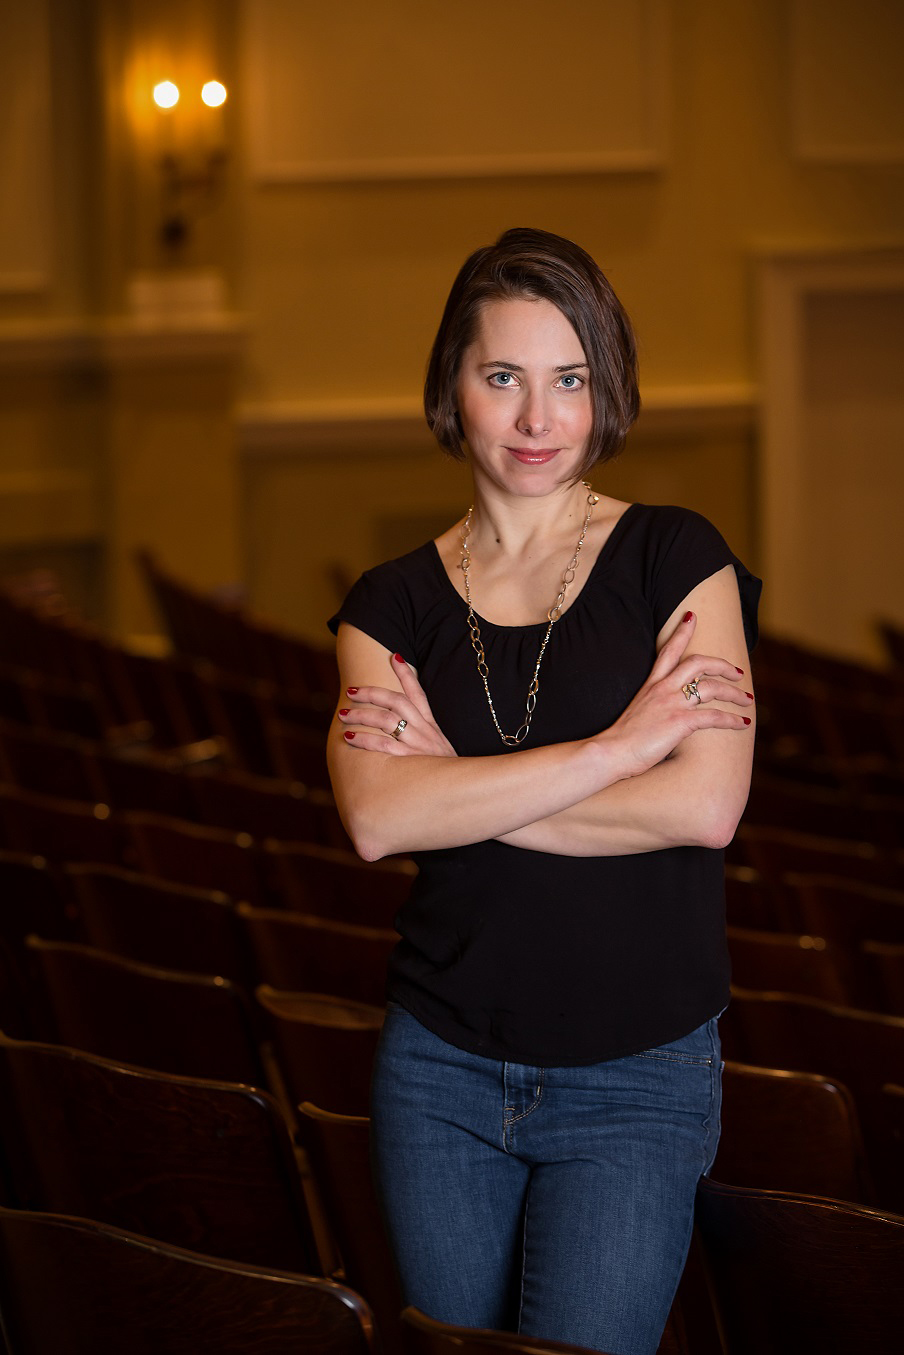 Local author Kristina Riggle